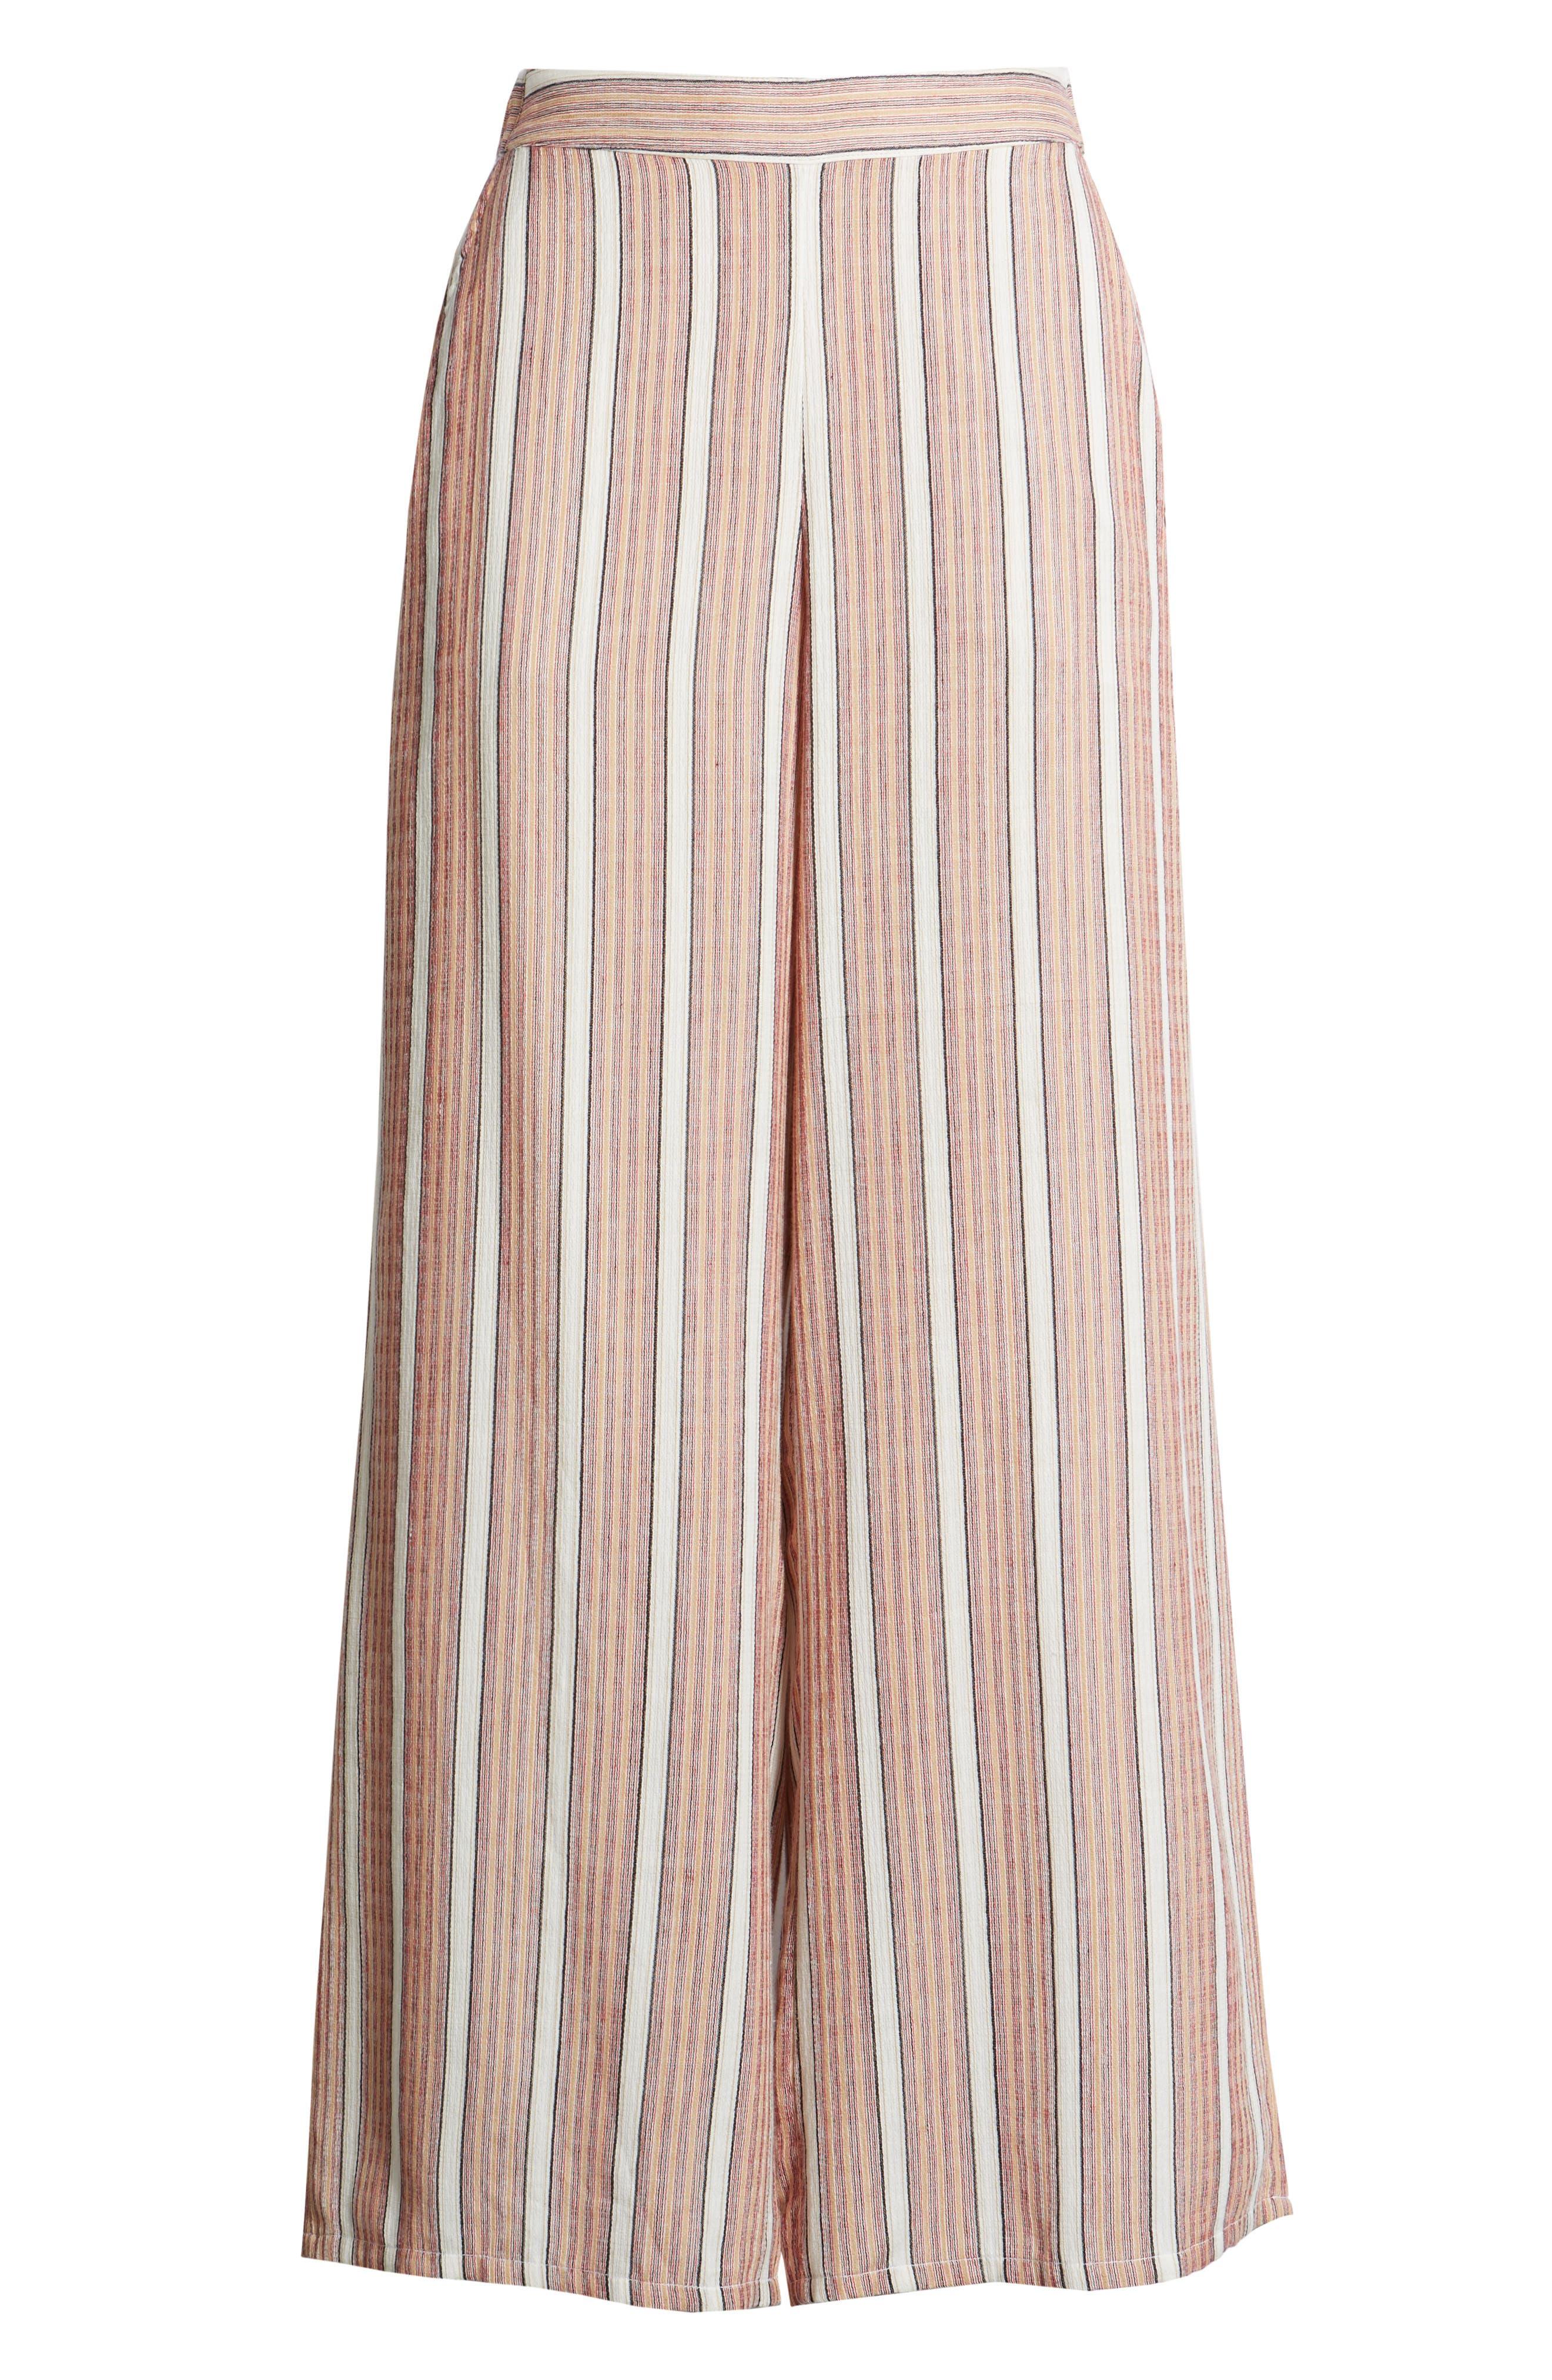 Midnight Avenue Stripe Pants,                             Alternate thumbnail 7, color,                             AMERICAN BEAUTY MULTI STRIPES